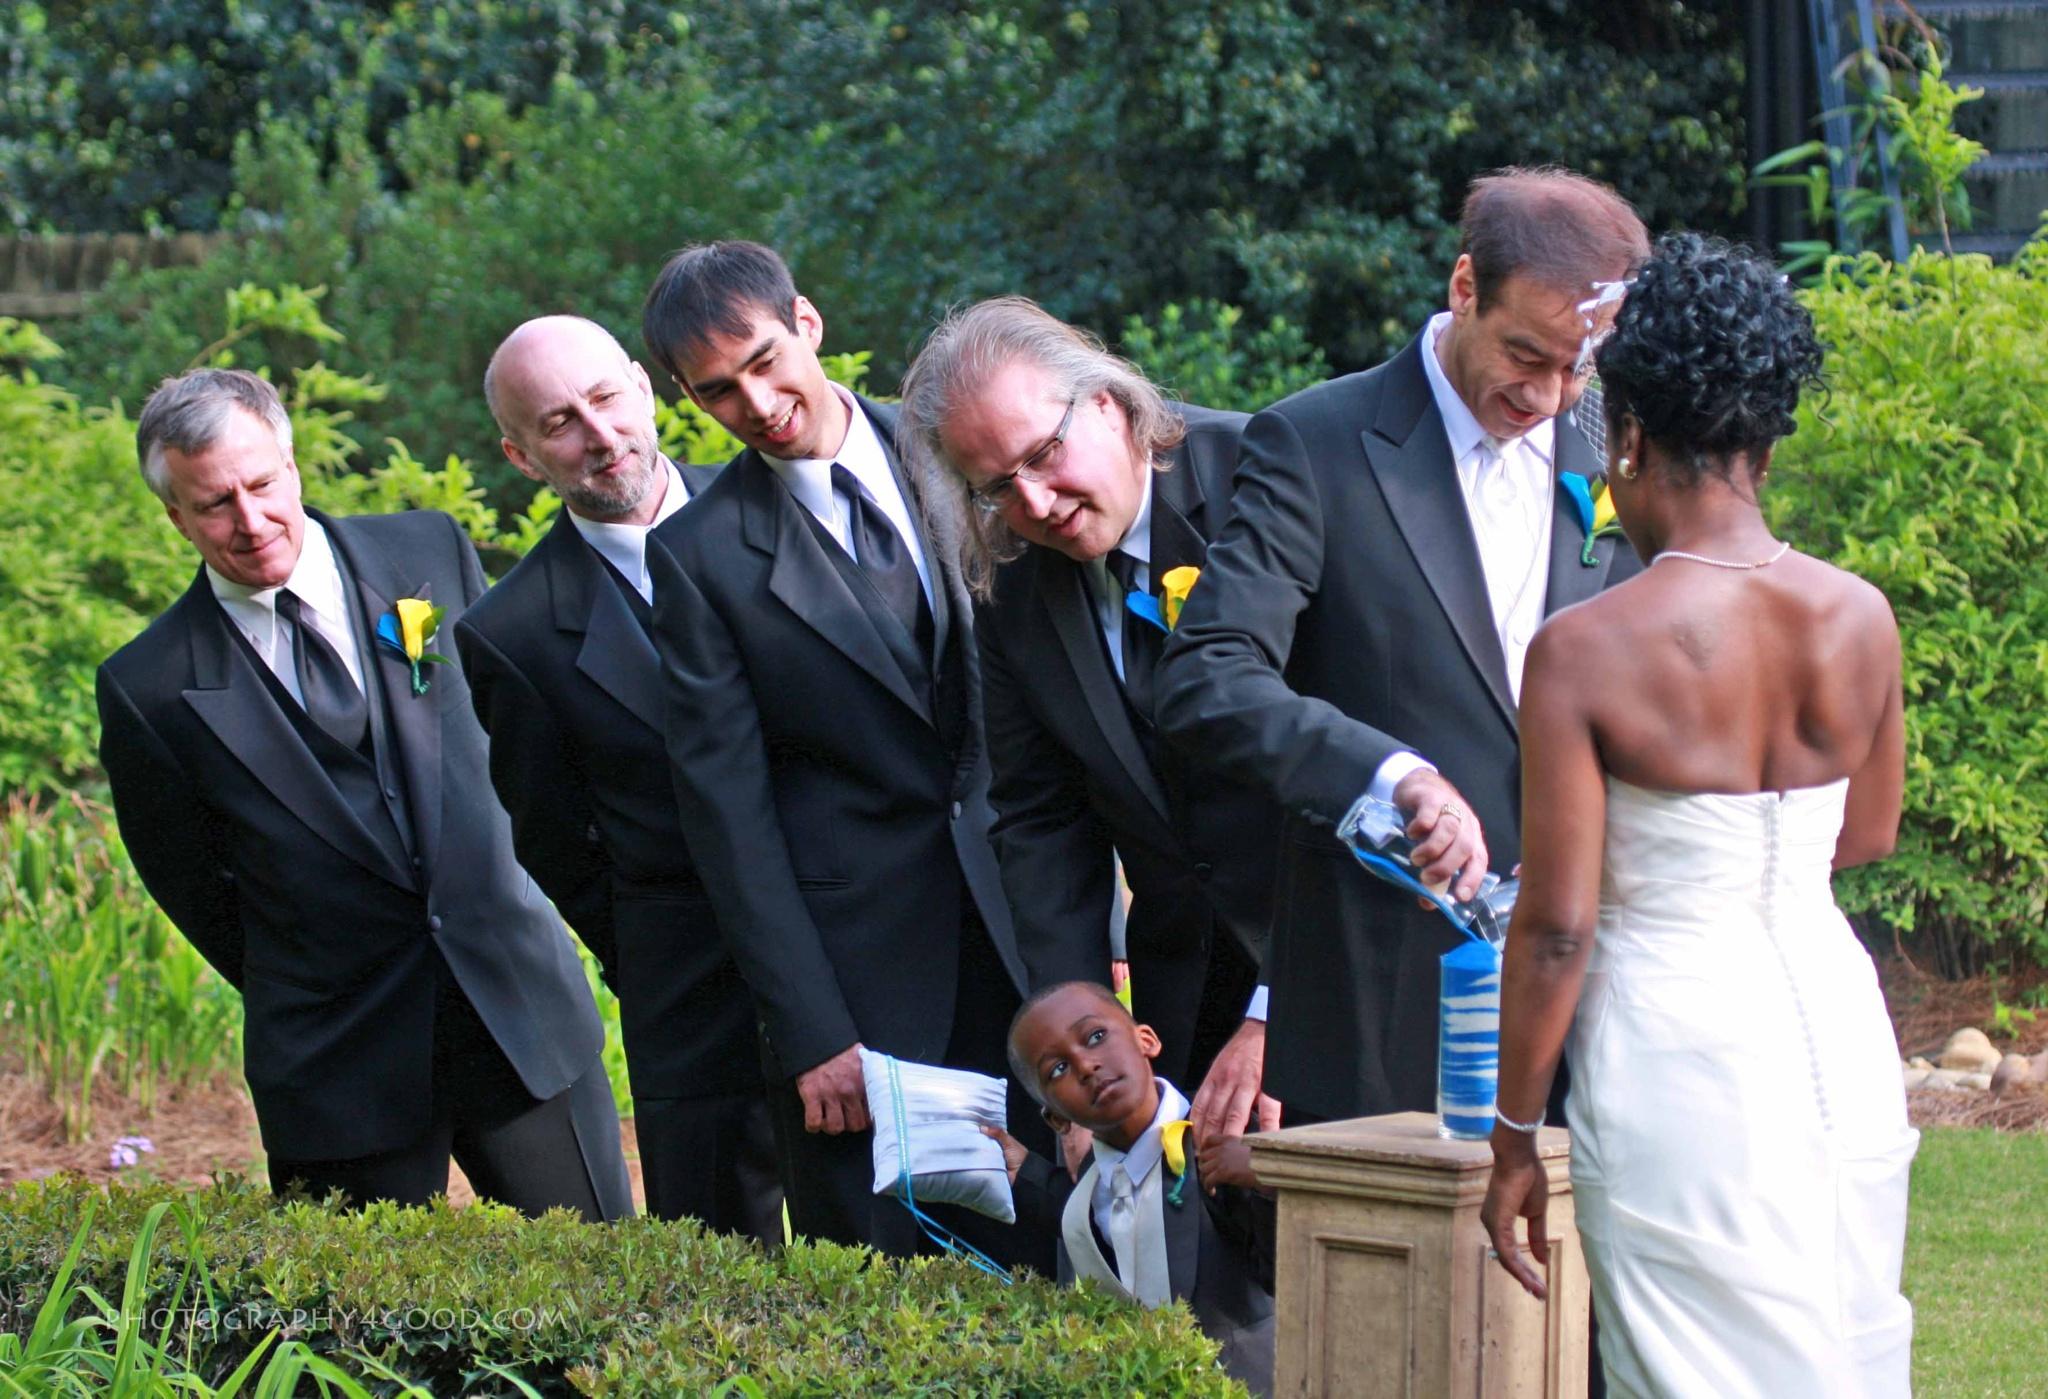 wedding curiosity by John_Ediger